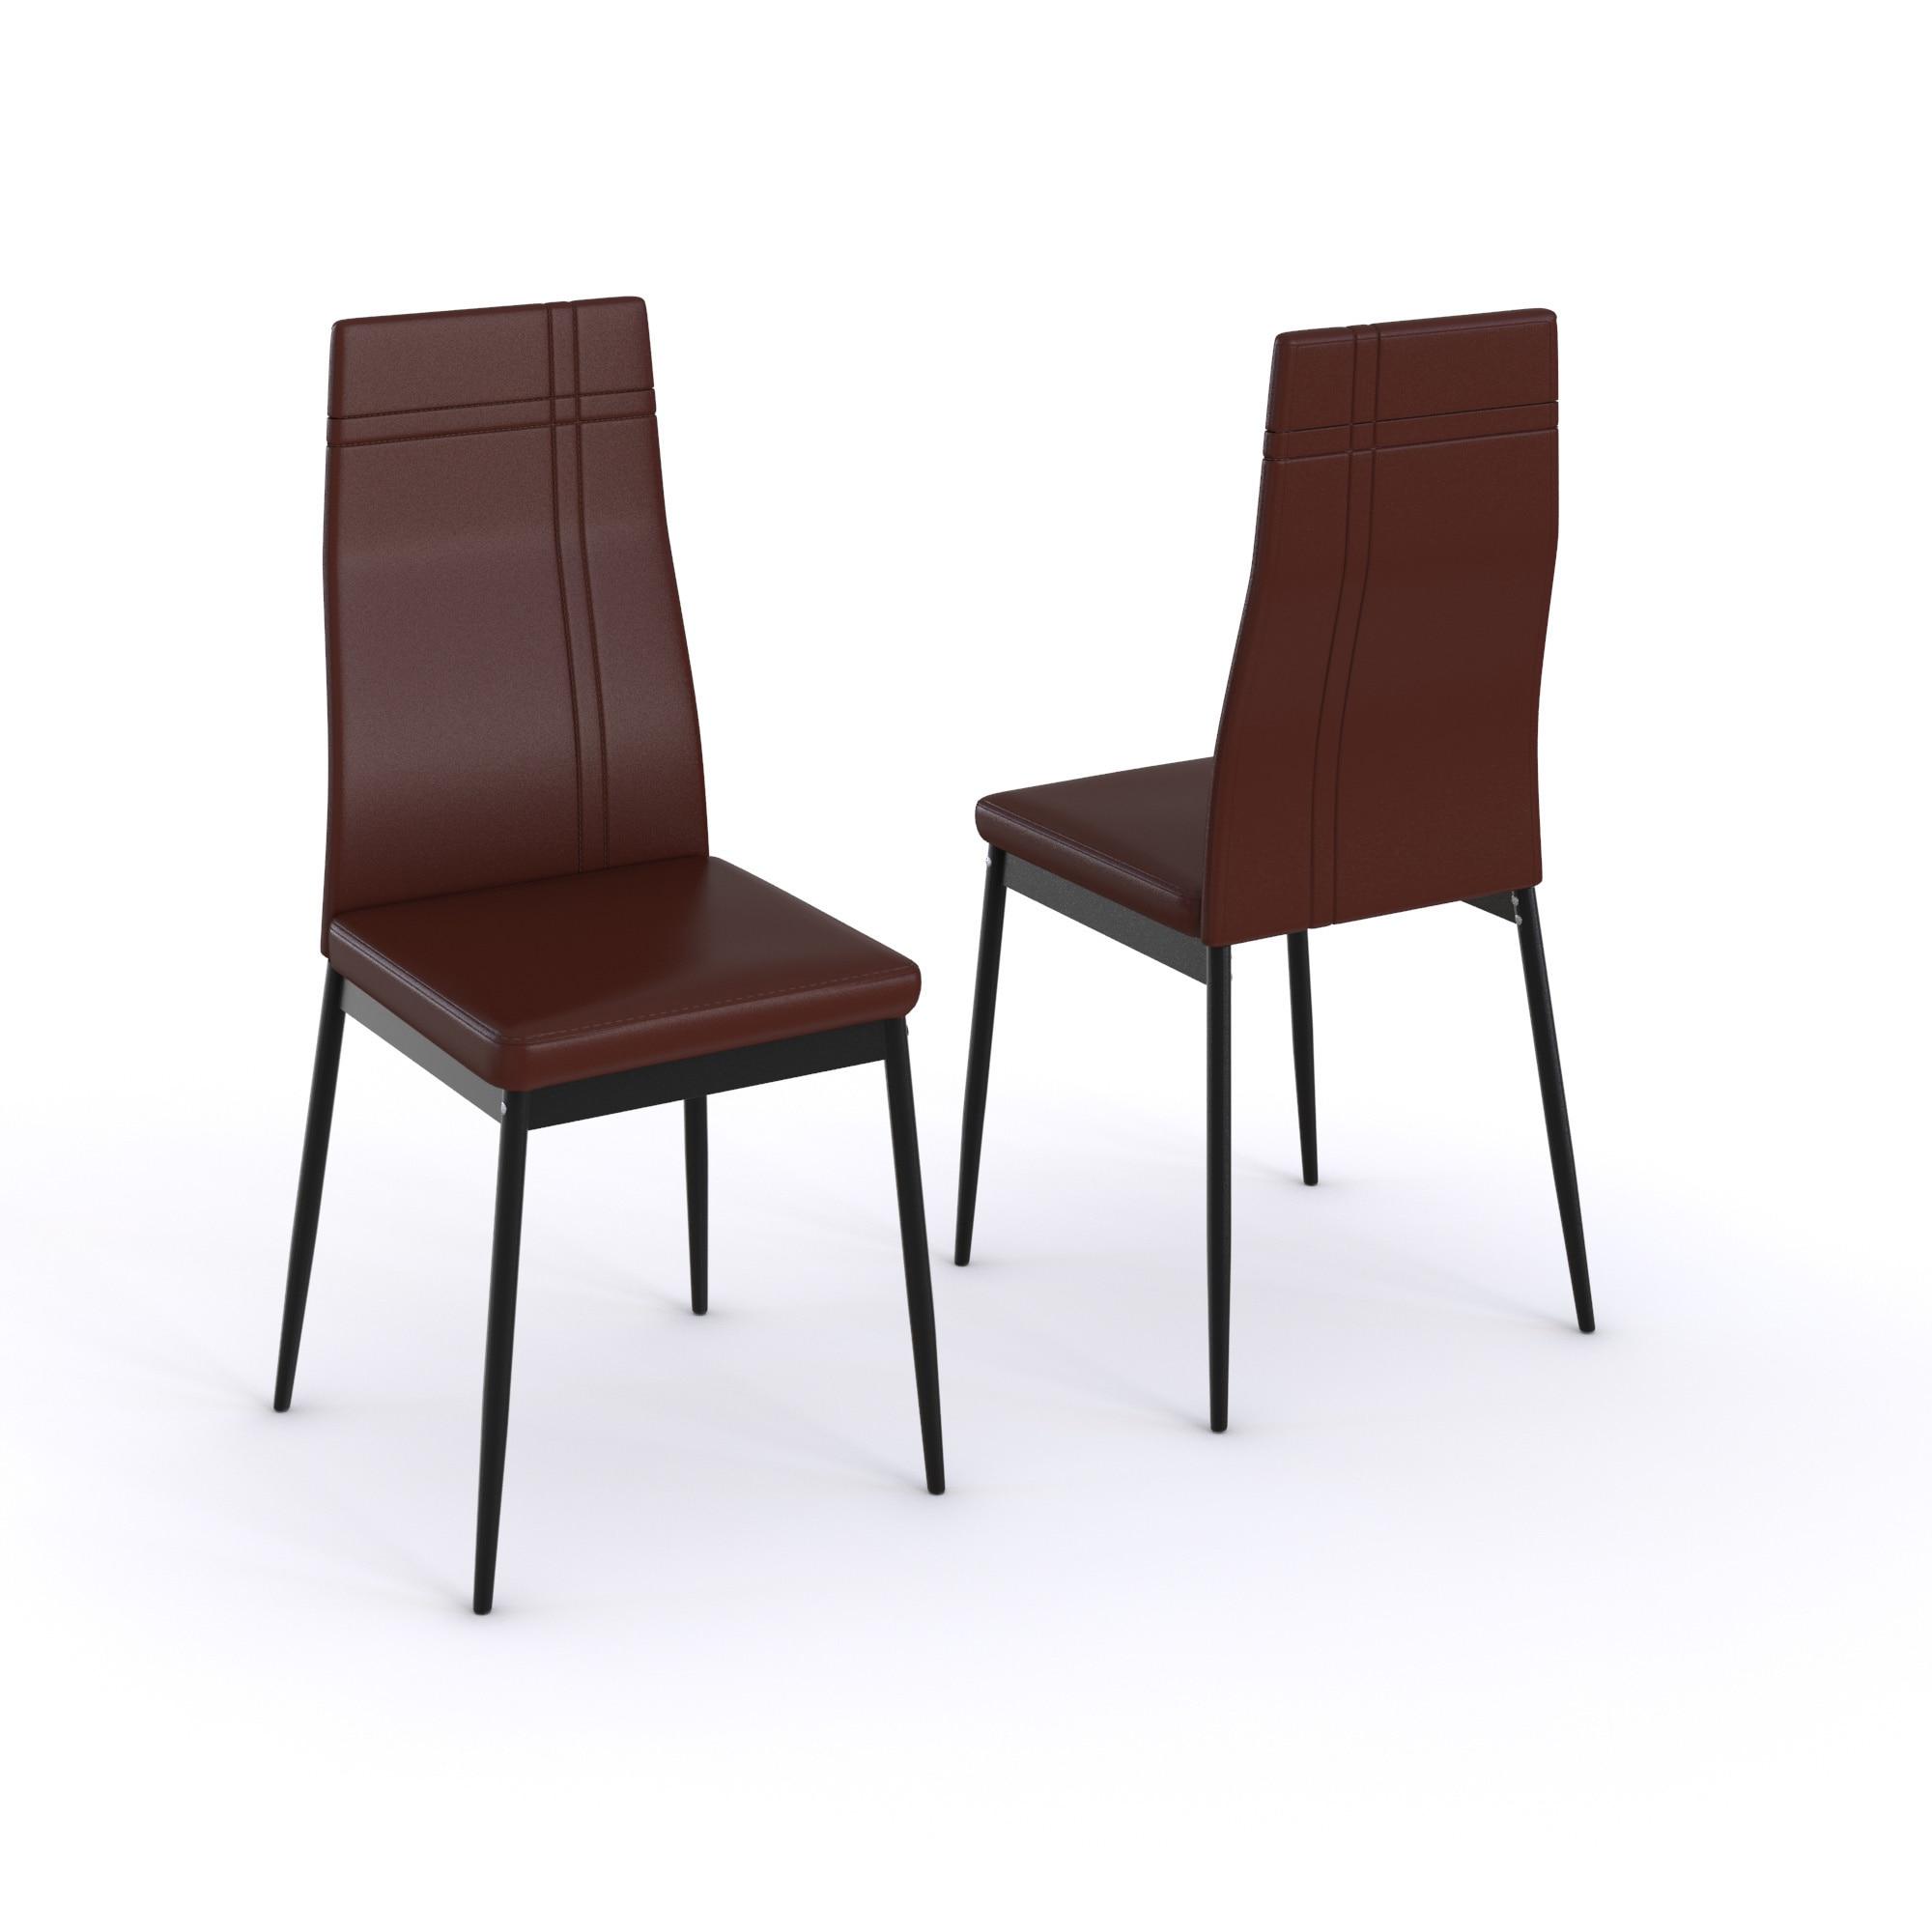 Porch & Den LoDo Larimer Dark Brown Faux Leather Side Chairs Set